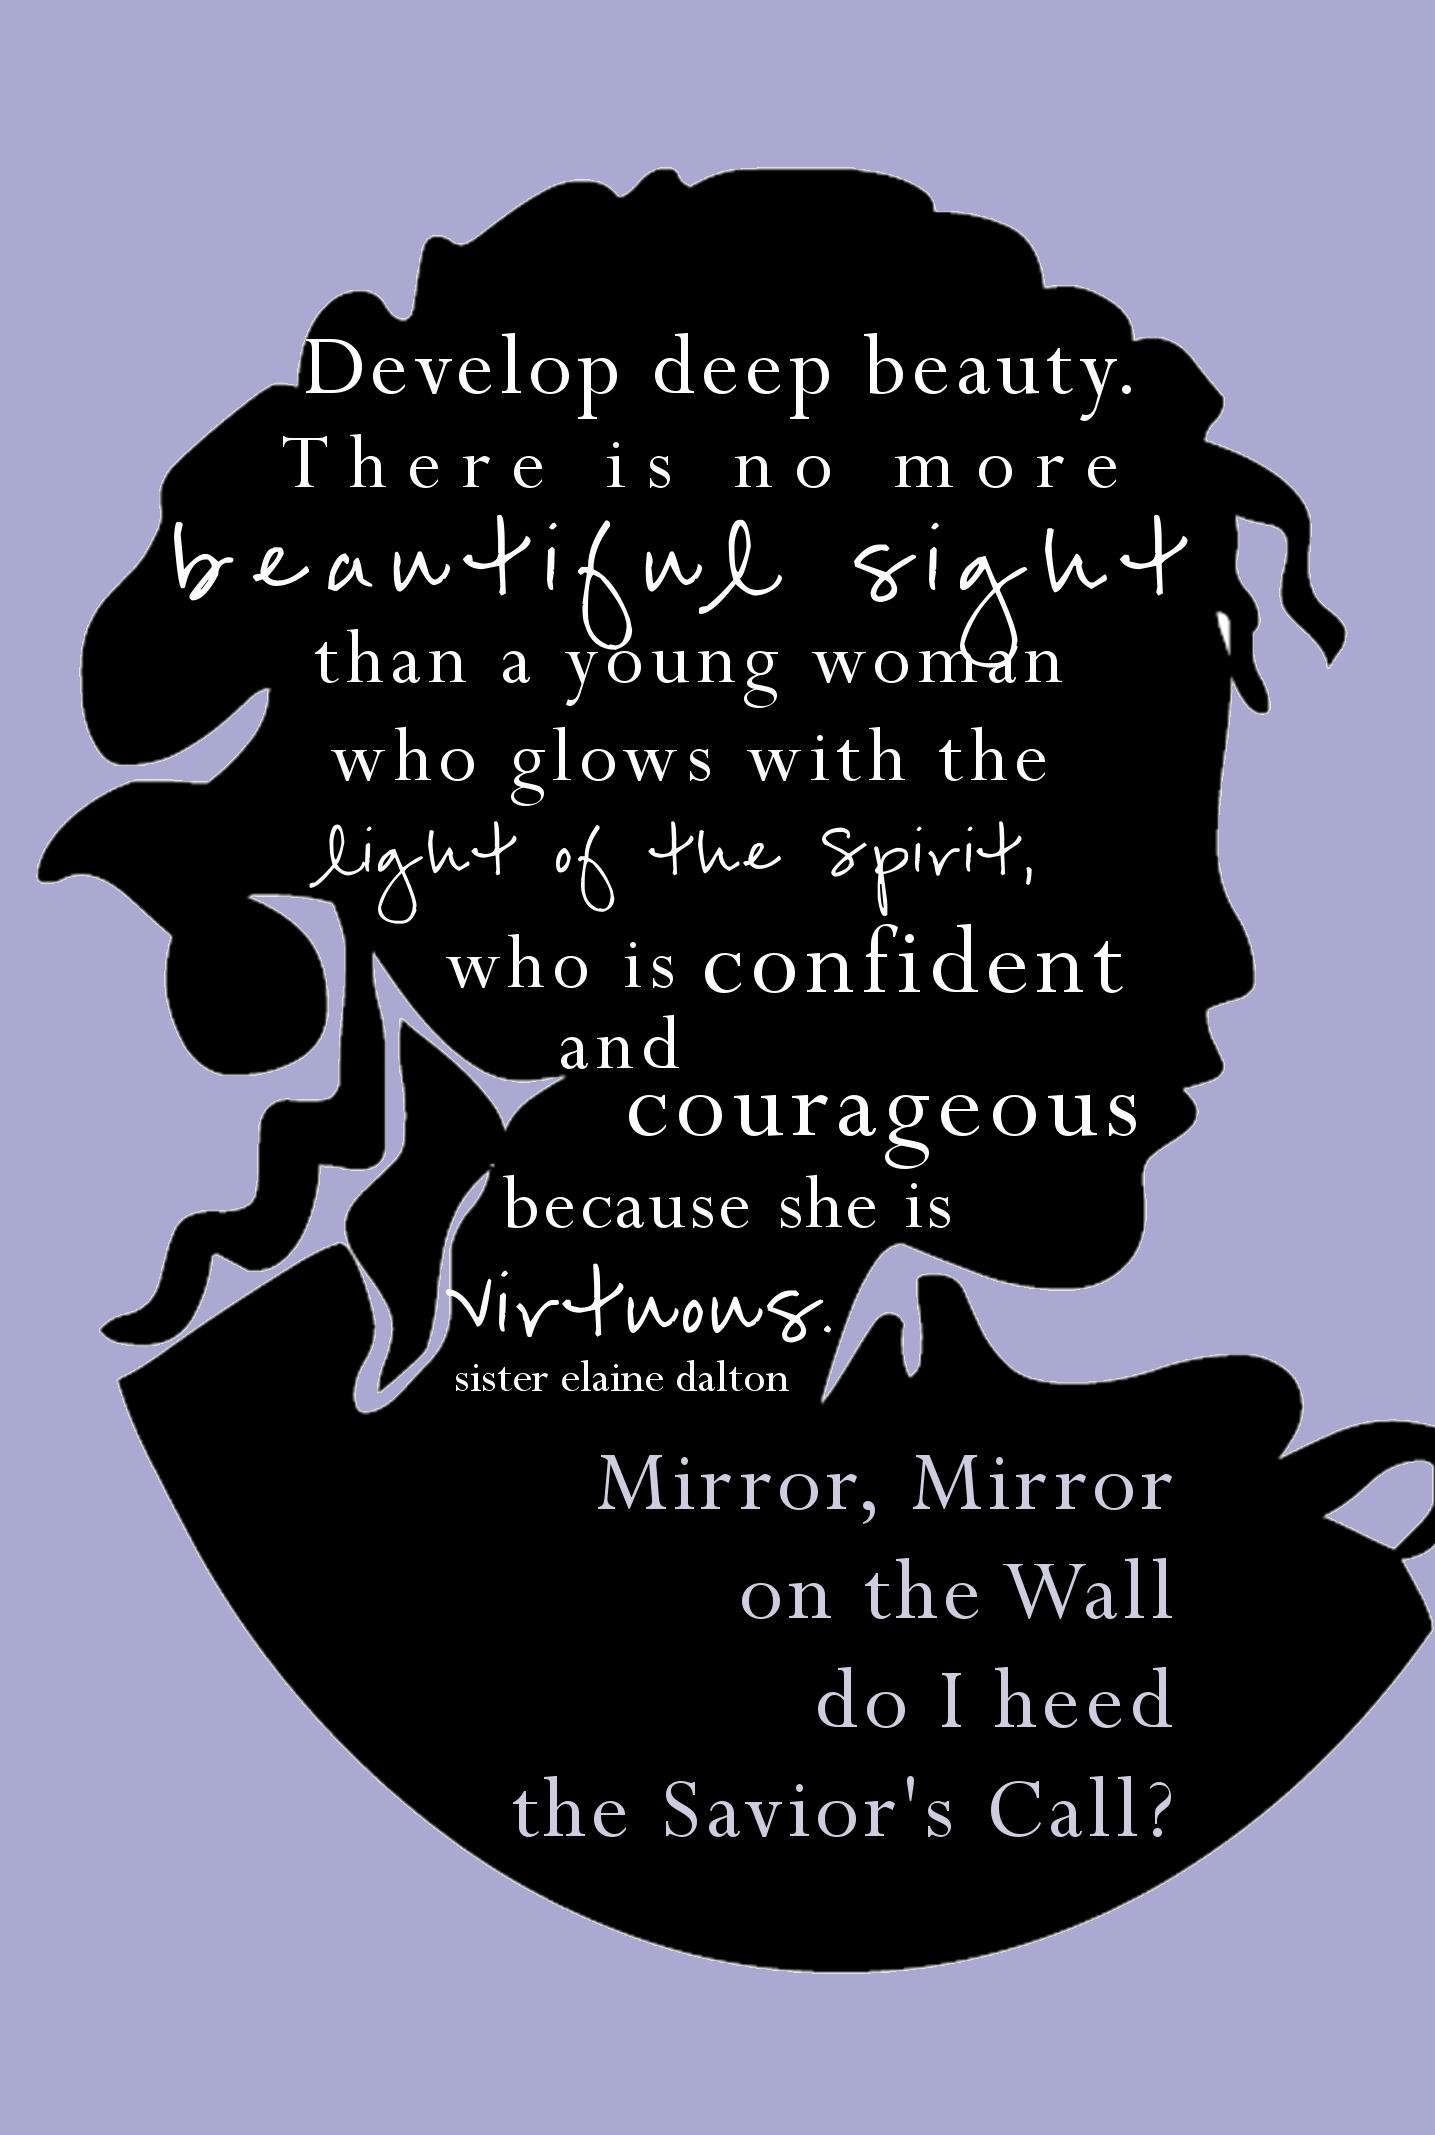 Richard G. Scott's quote #5